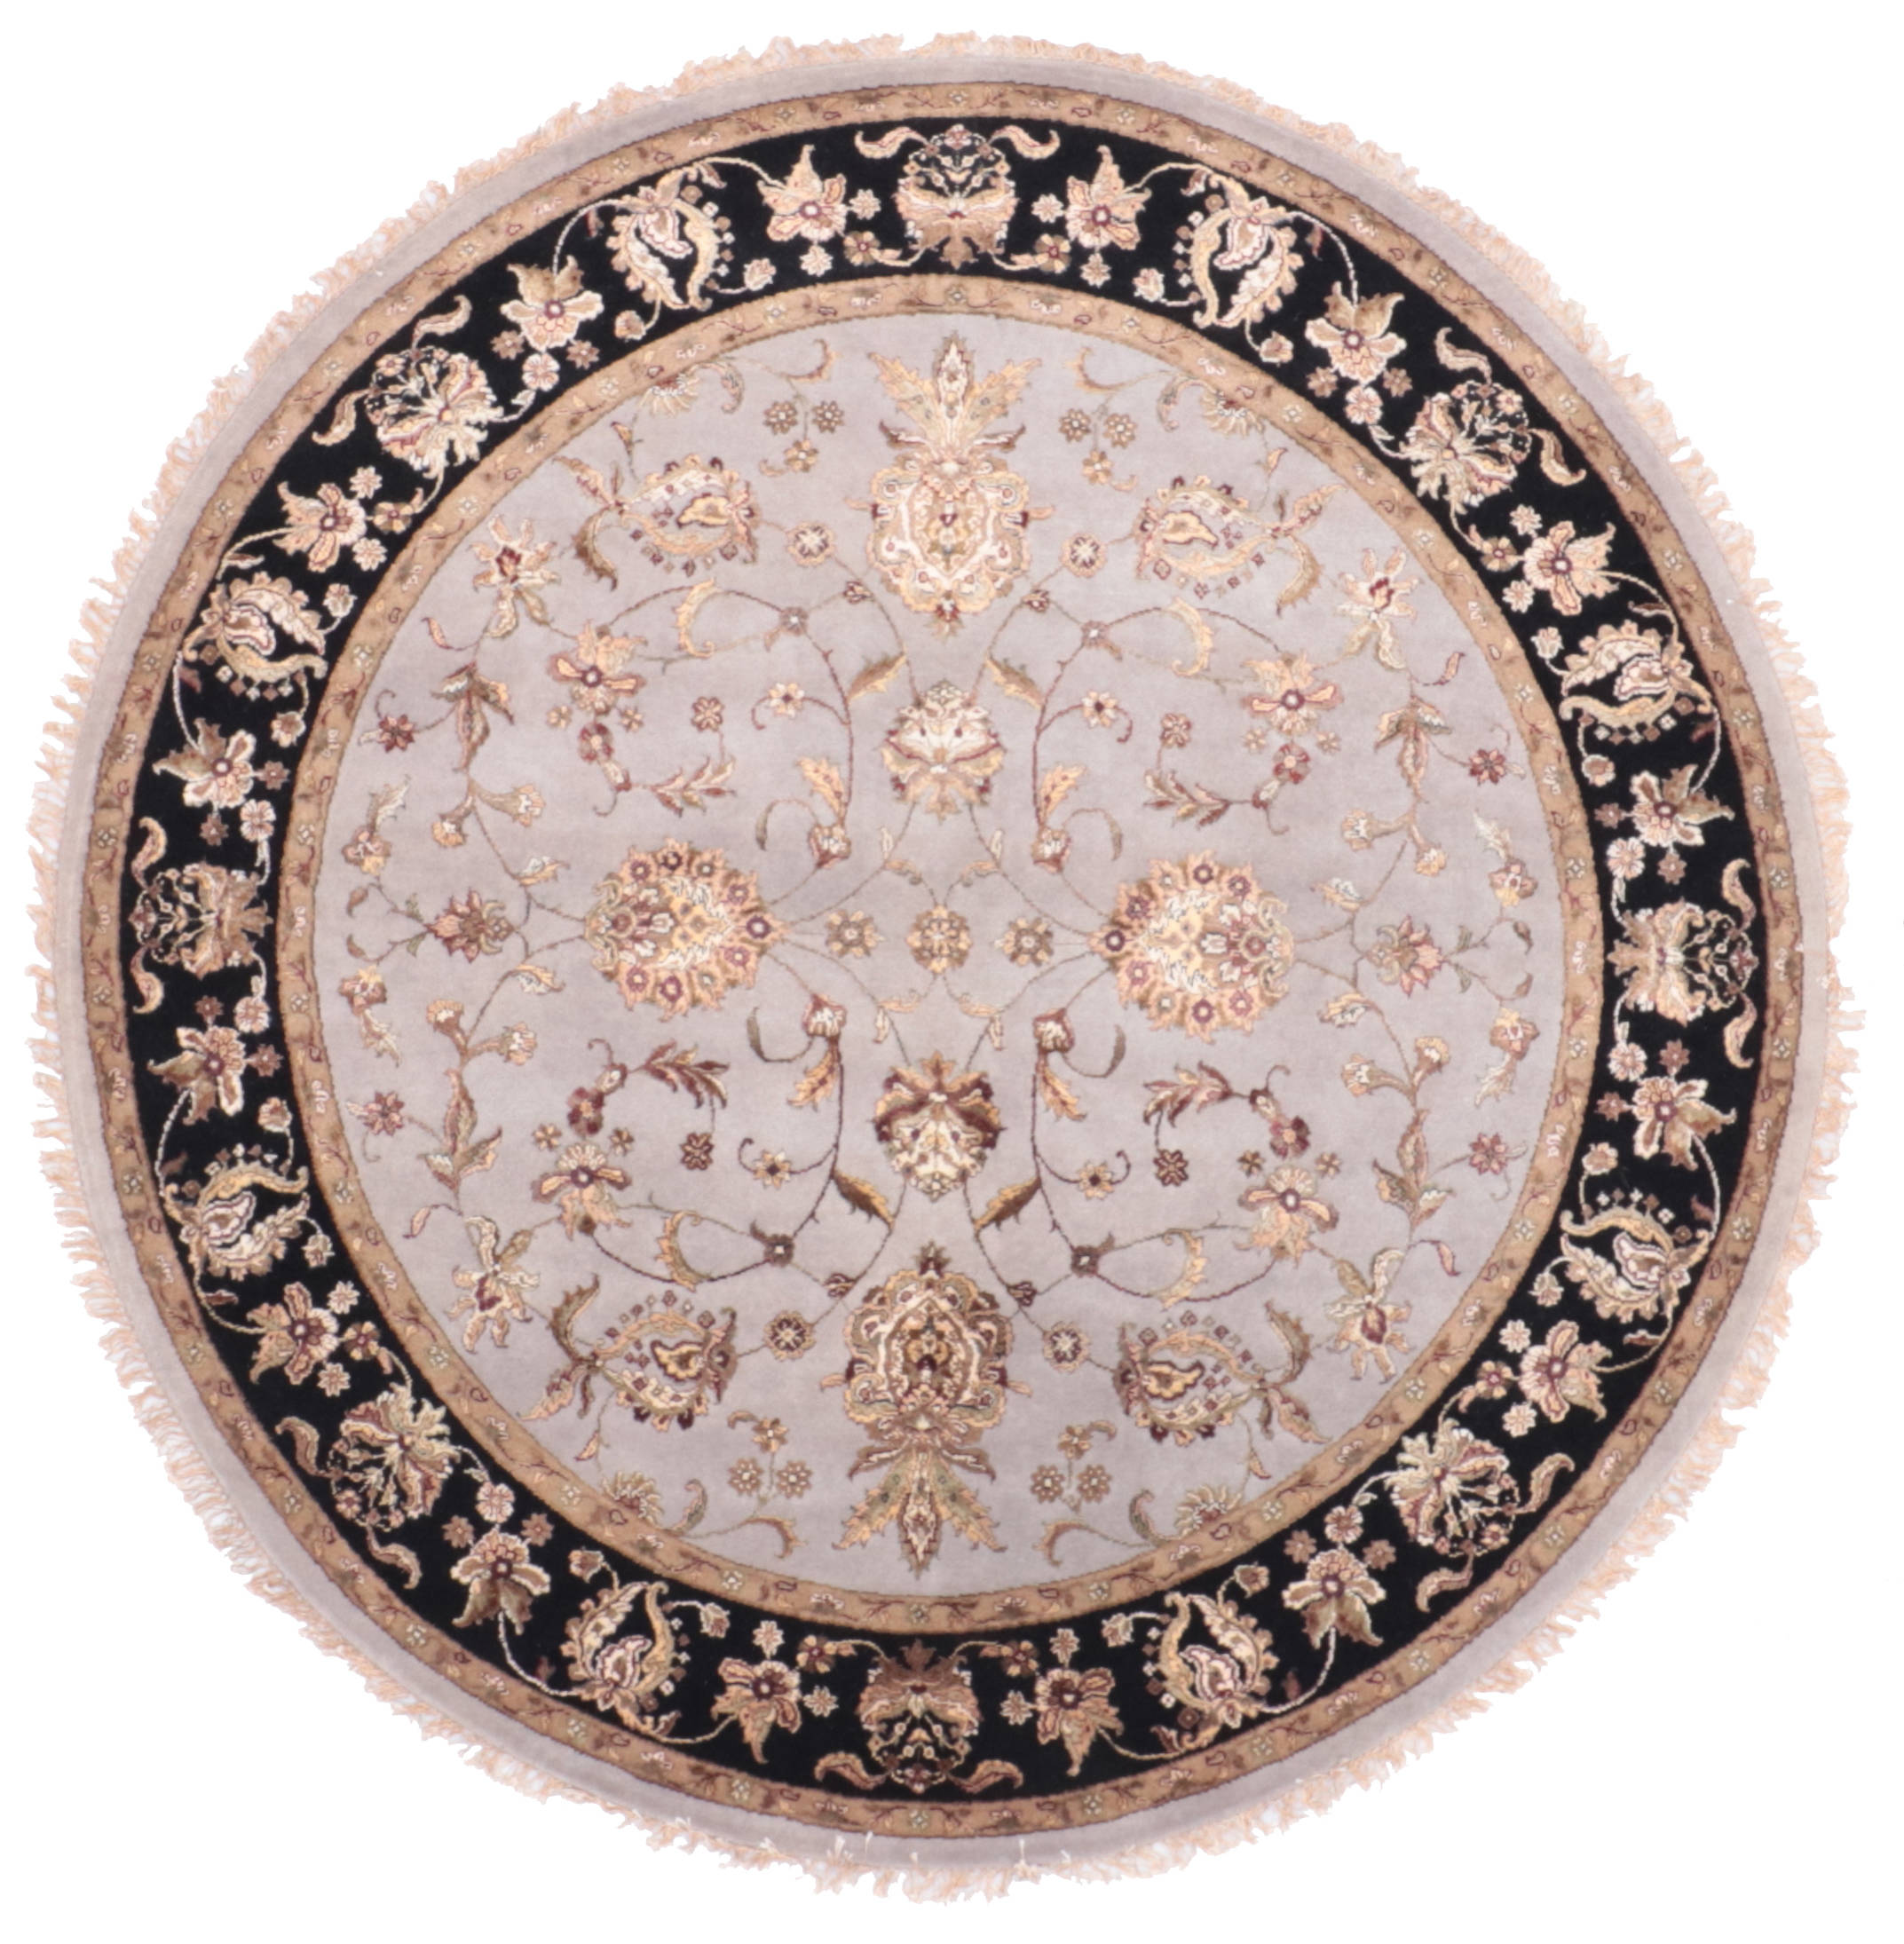 Indian Jaipur Blue Round 7 To 8 Ft Wool And Raised Silk Carpet 135657 Sku 135657